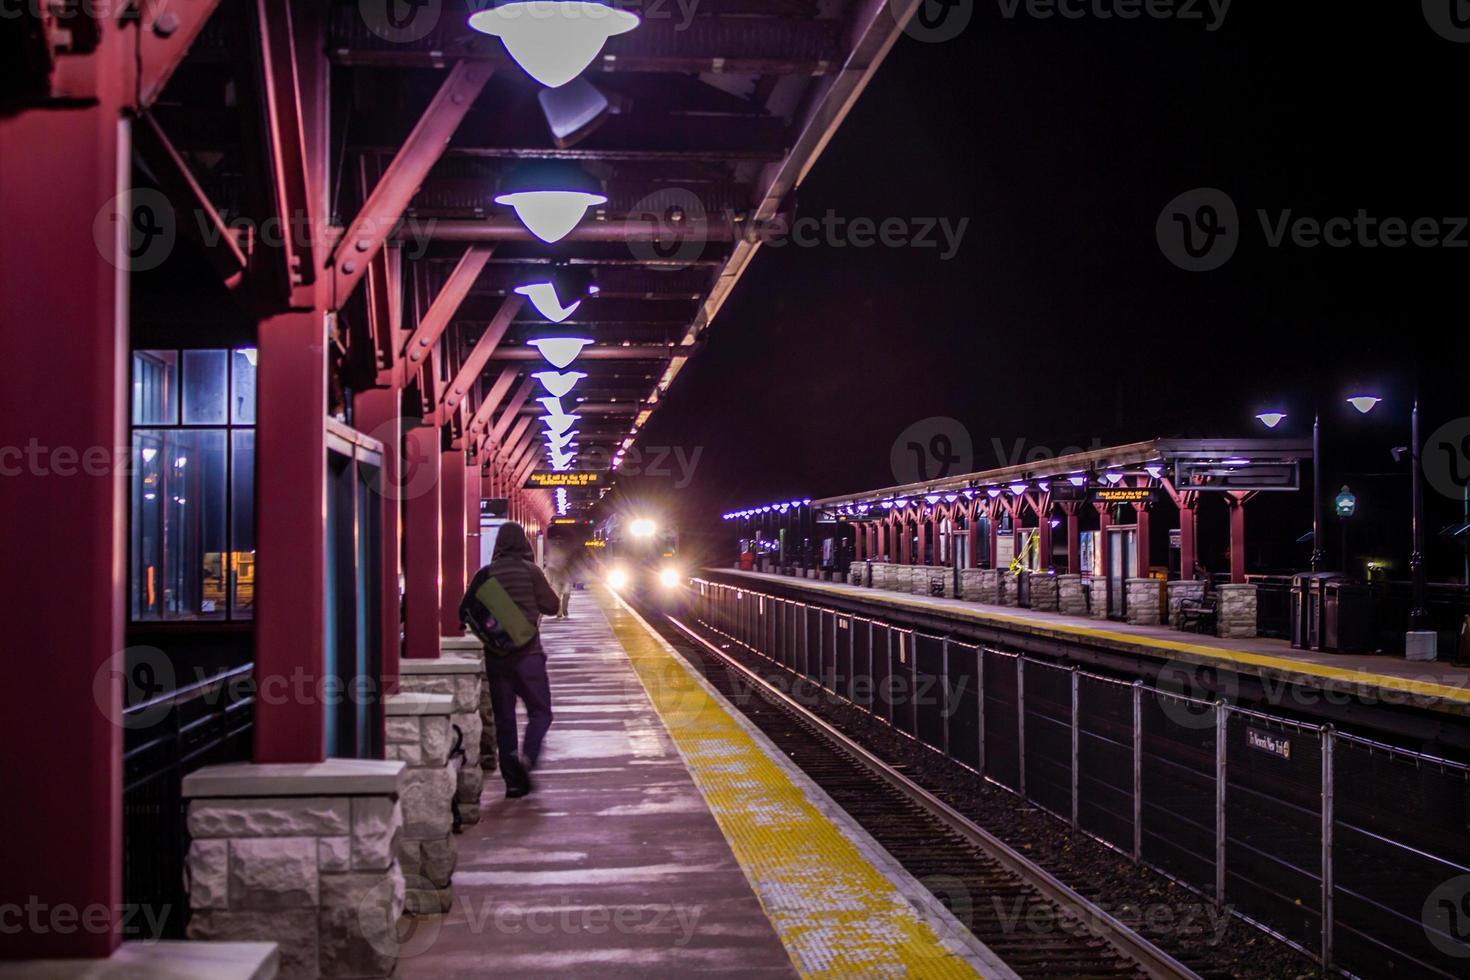 stazione ferroviaria di notte foto